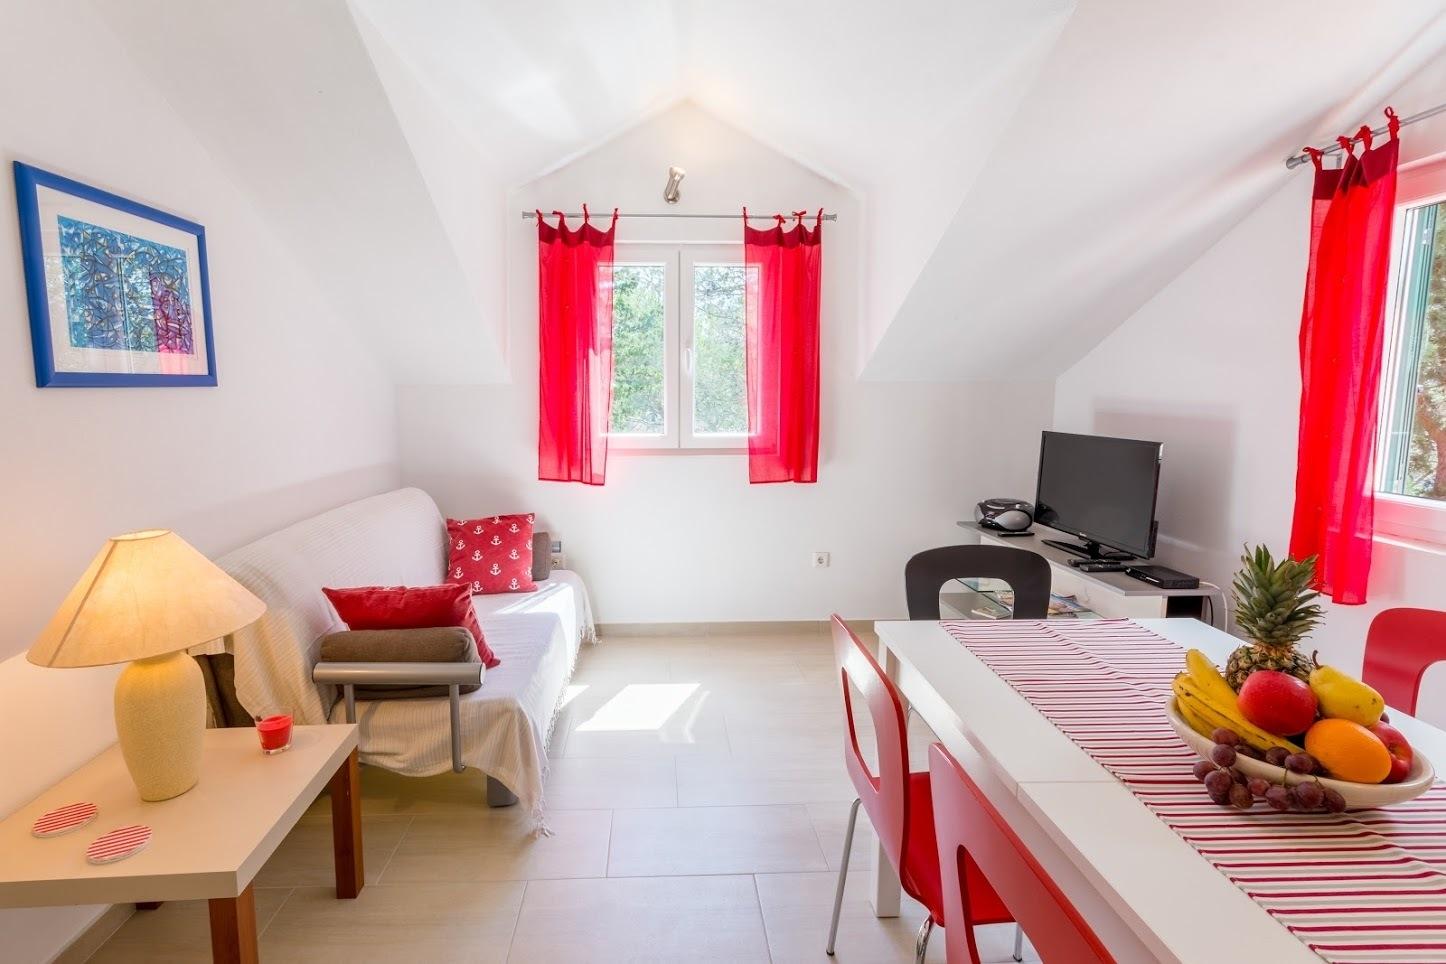 Simi - Baai Osibova (Milna) - Verblijf in lagunes Kroatië - A1(4+1): woonkamer